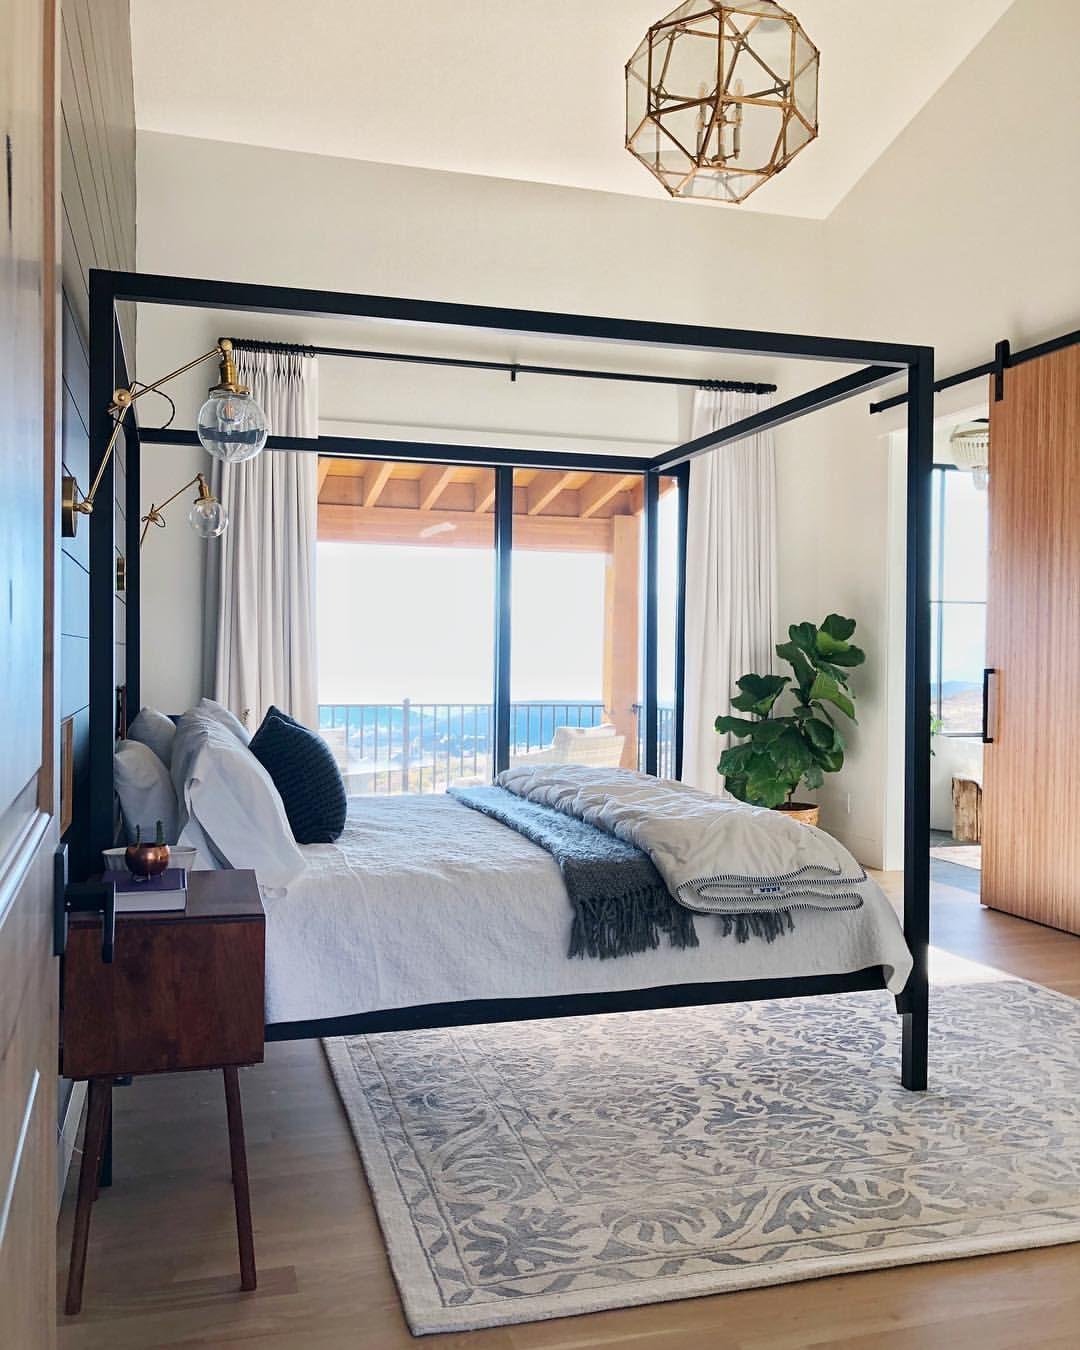 Kathleen Field Utah Designer On Instagram Good Morning Hope Your Day S Off To A Good Start Masterbe Hotel Interior Design Luxury Hotel Hotels Room